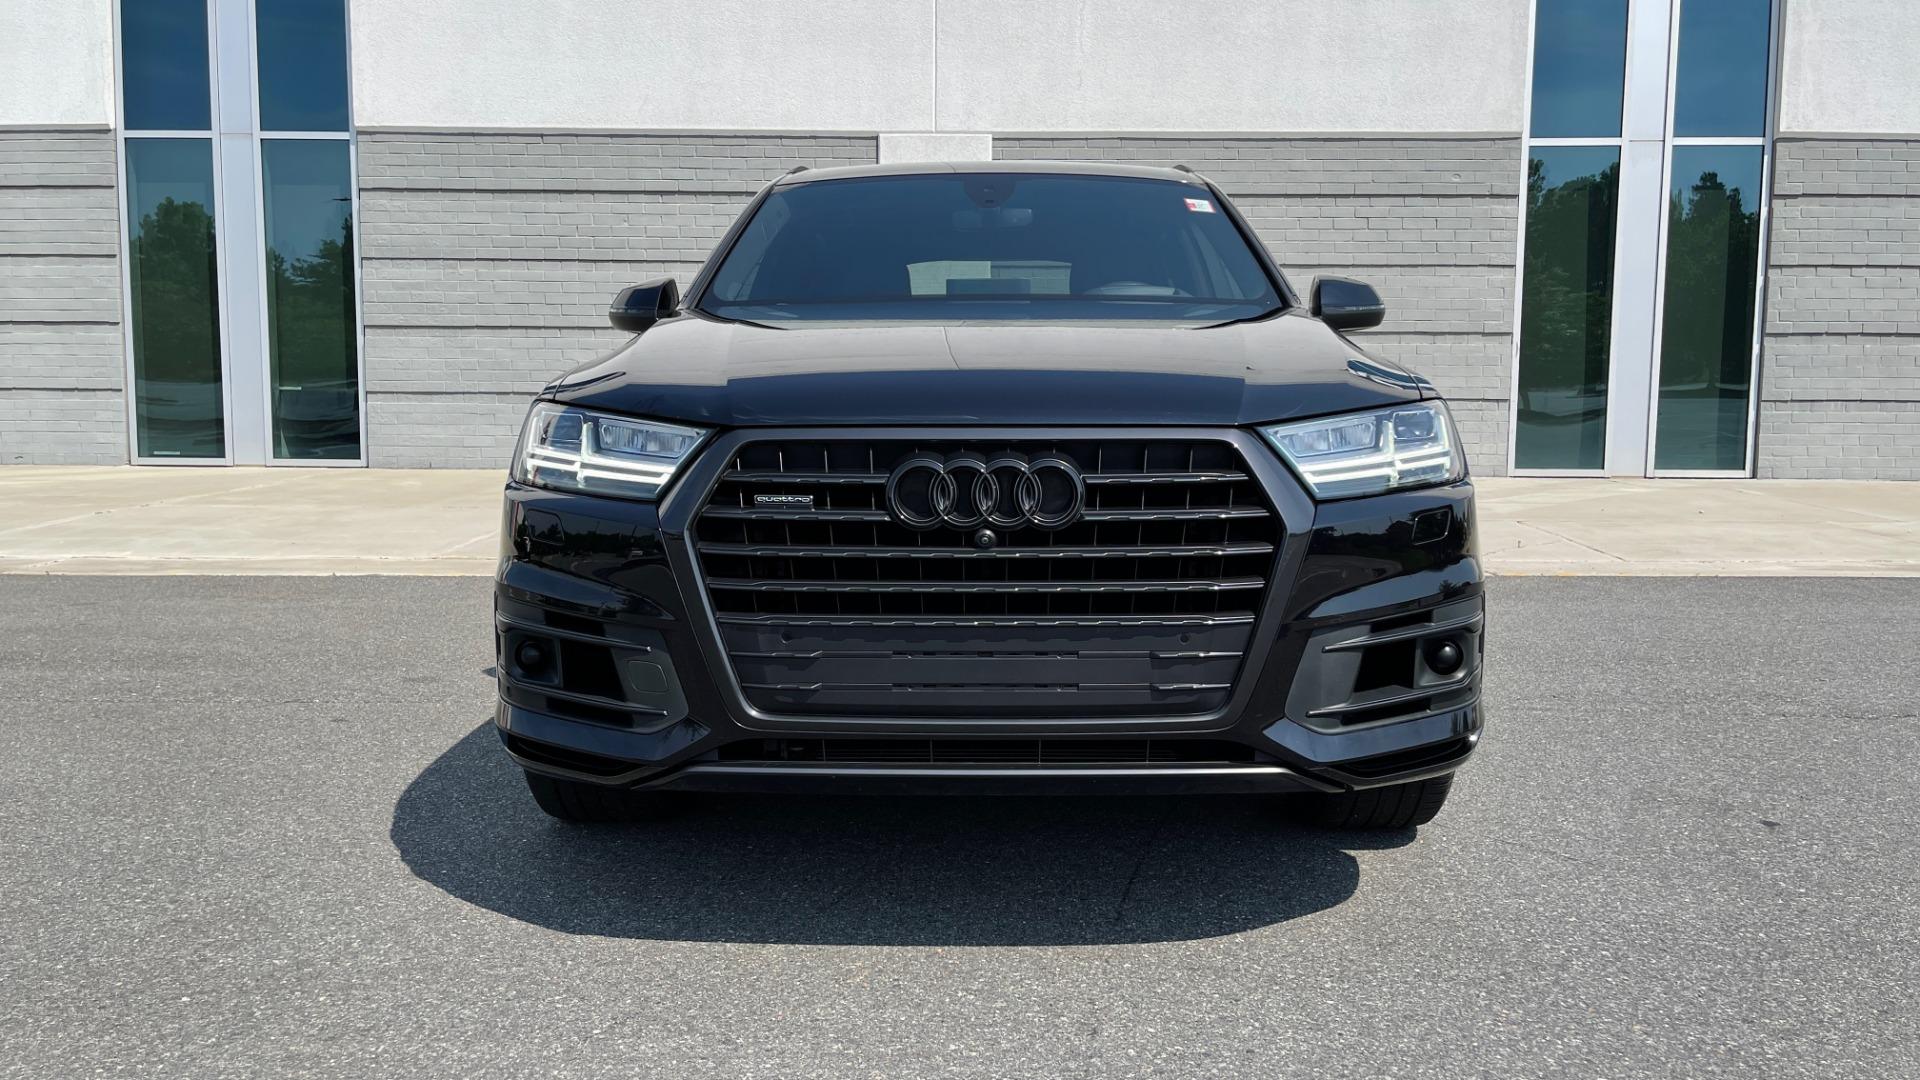 Used 2018 Audi Q7 PRESTIGE TIPTRONIC / NAV / SUNROOF / ADAPTIVE PKG / DRVR ASST / CLD WTHR /  for sale $49,995 at Formula Imports in Charlotte NC 28227 9